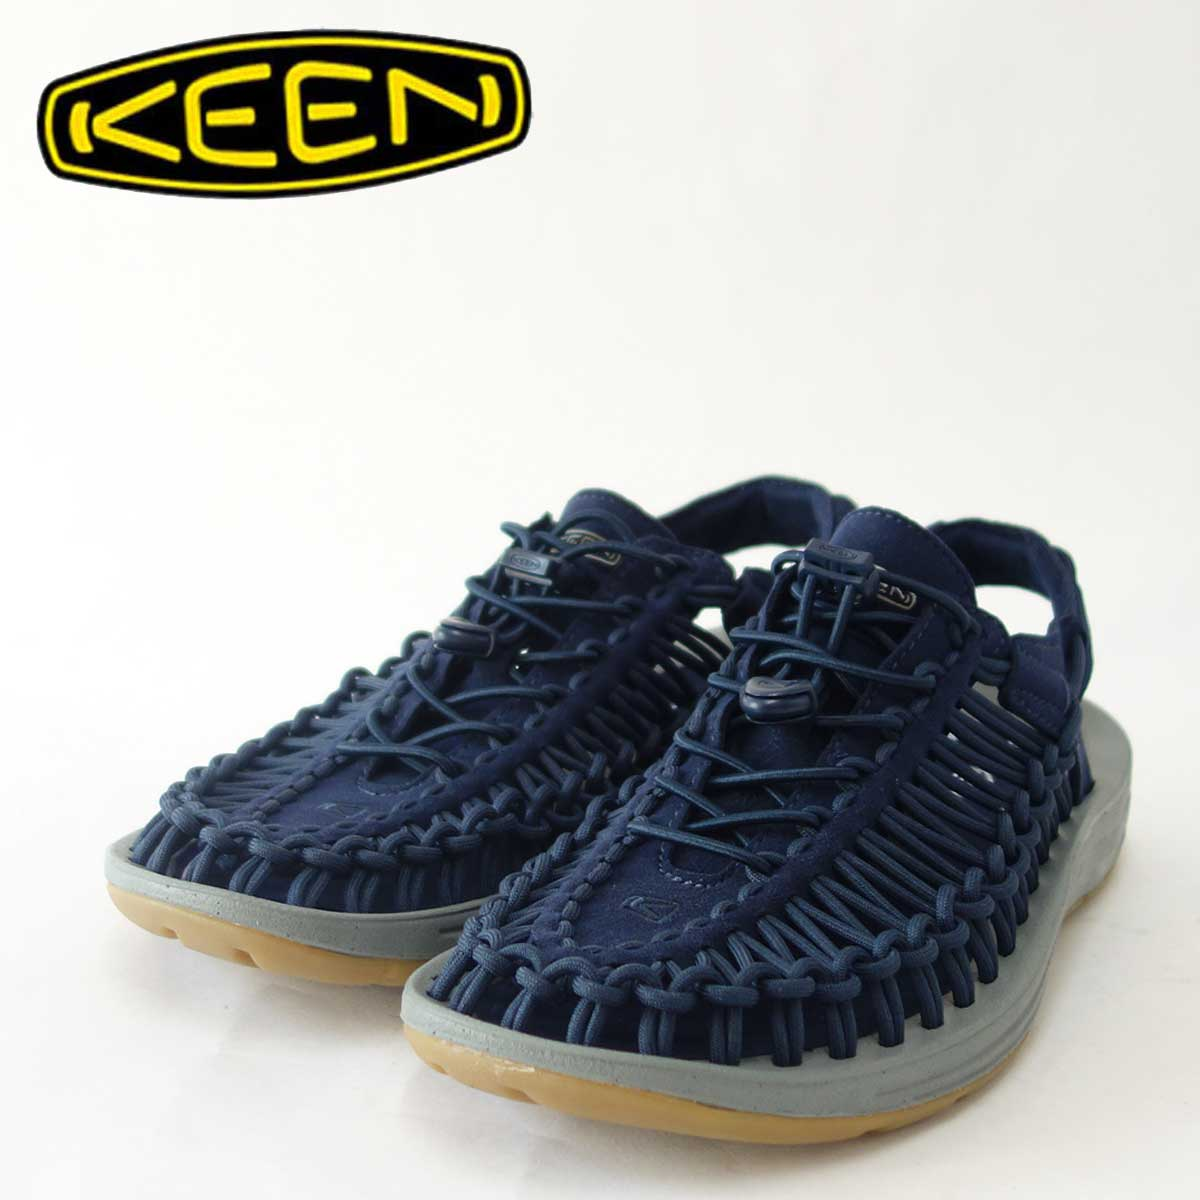 KEEN キーン UNEEK(ユニーク) 1017032(メンズ)キーン独自のハイブリッドサンダル カラー:Dress Blues/Neutral Gray「靴」